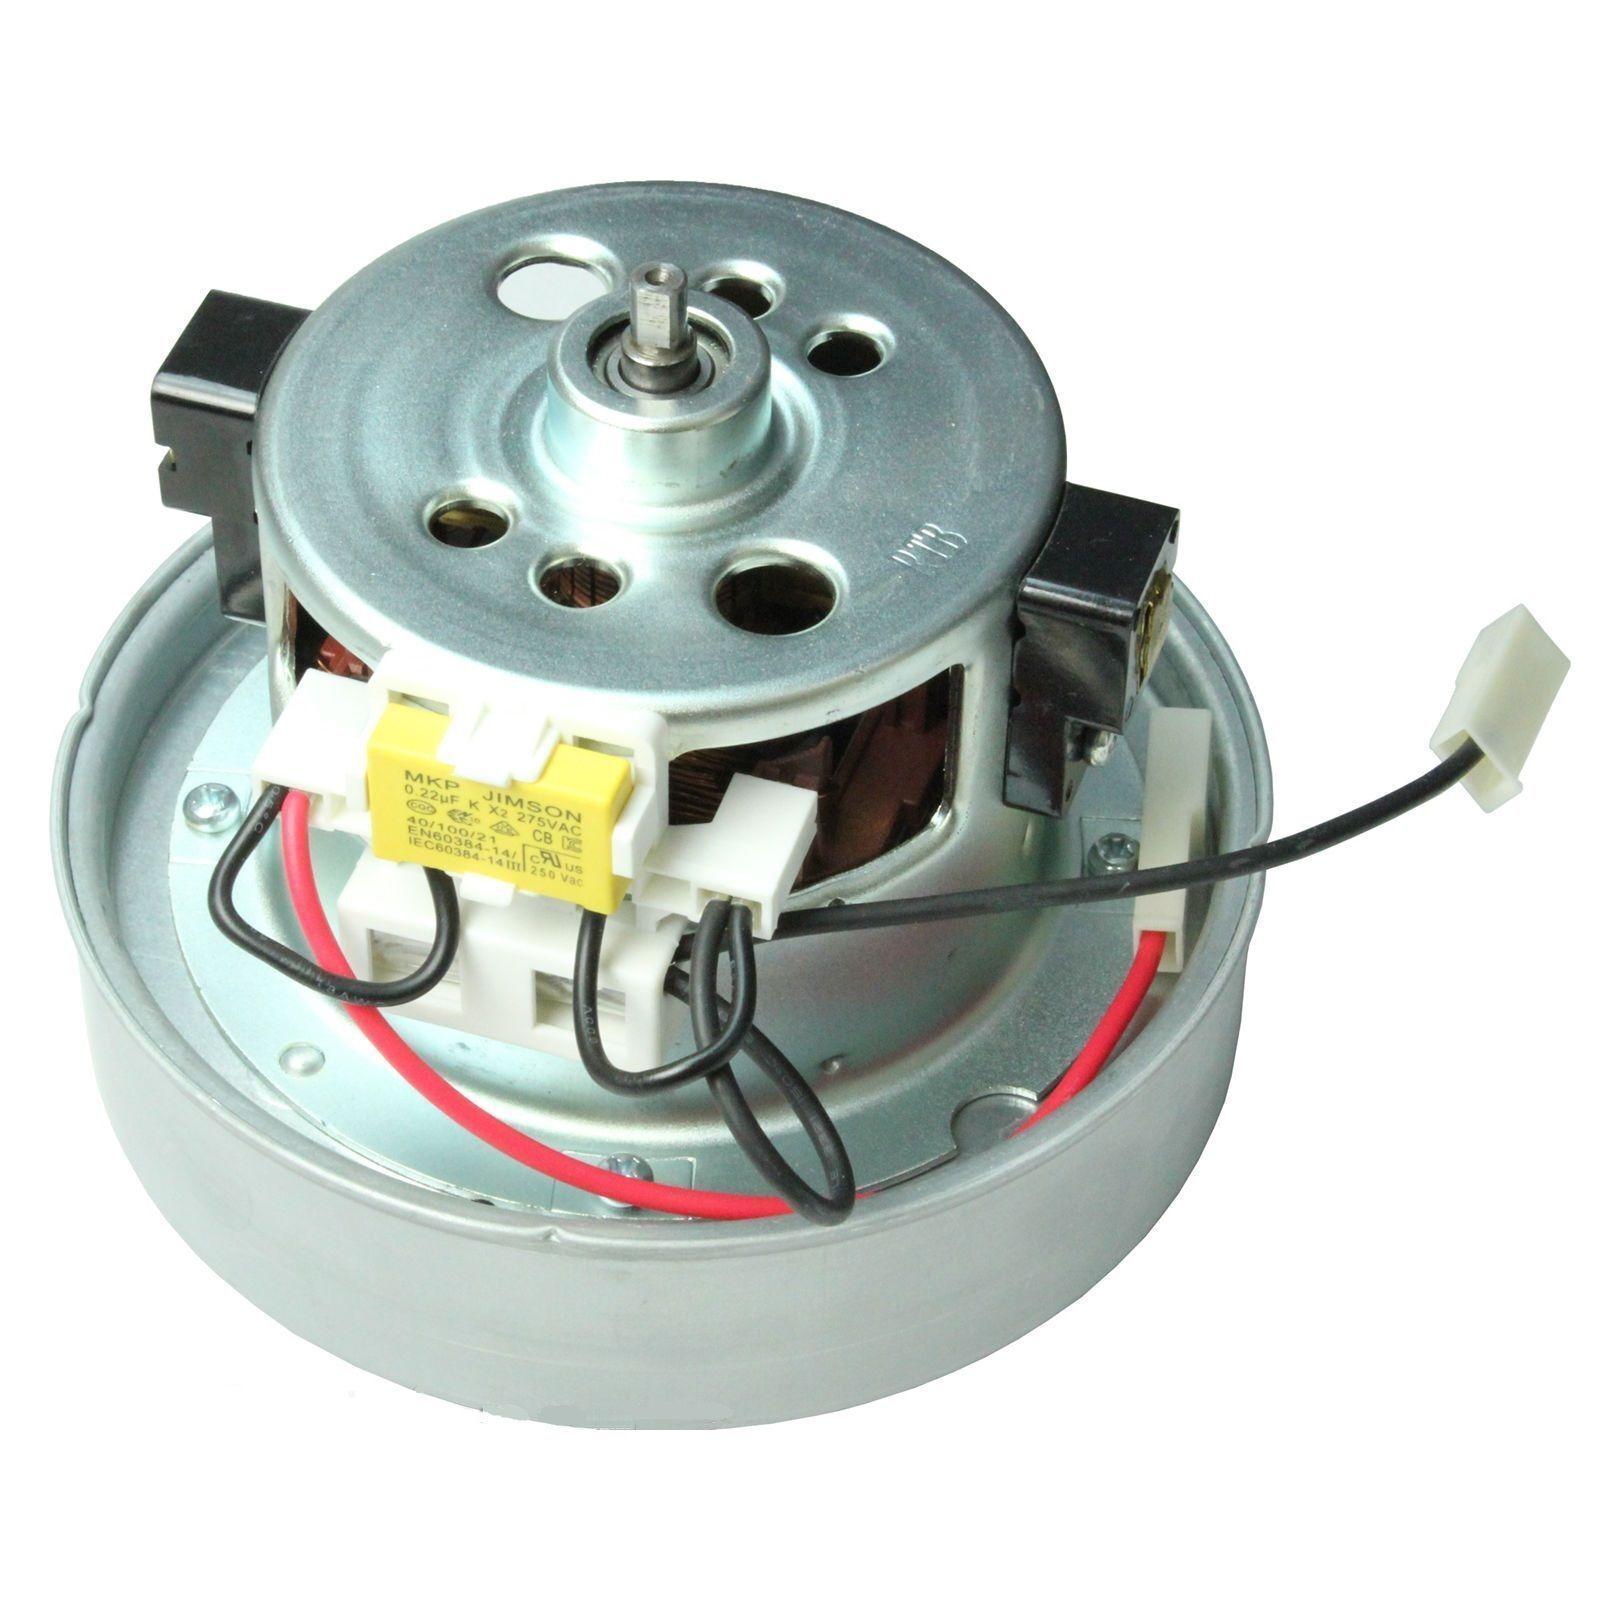 Мотор dyson dc23 вентиляторы dyson